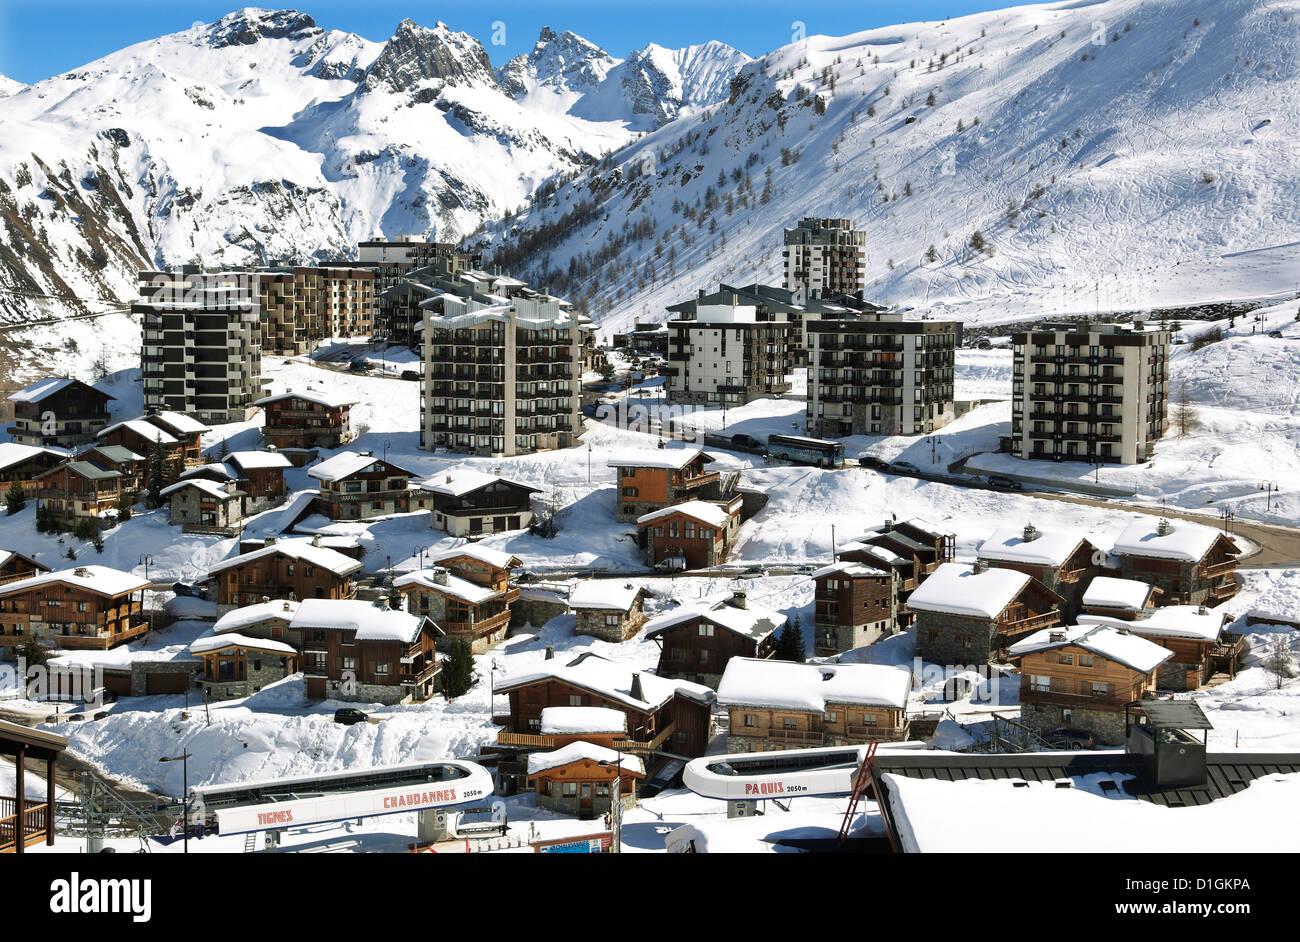 Tignes-le-Lac, Tignes, Savoie, Rhone-Alpes, French Alps, France, Europe Stock Photo